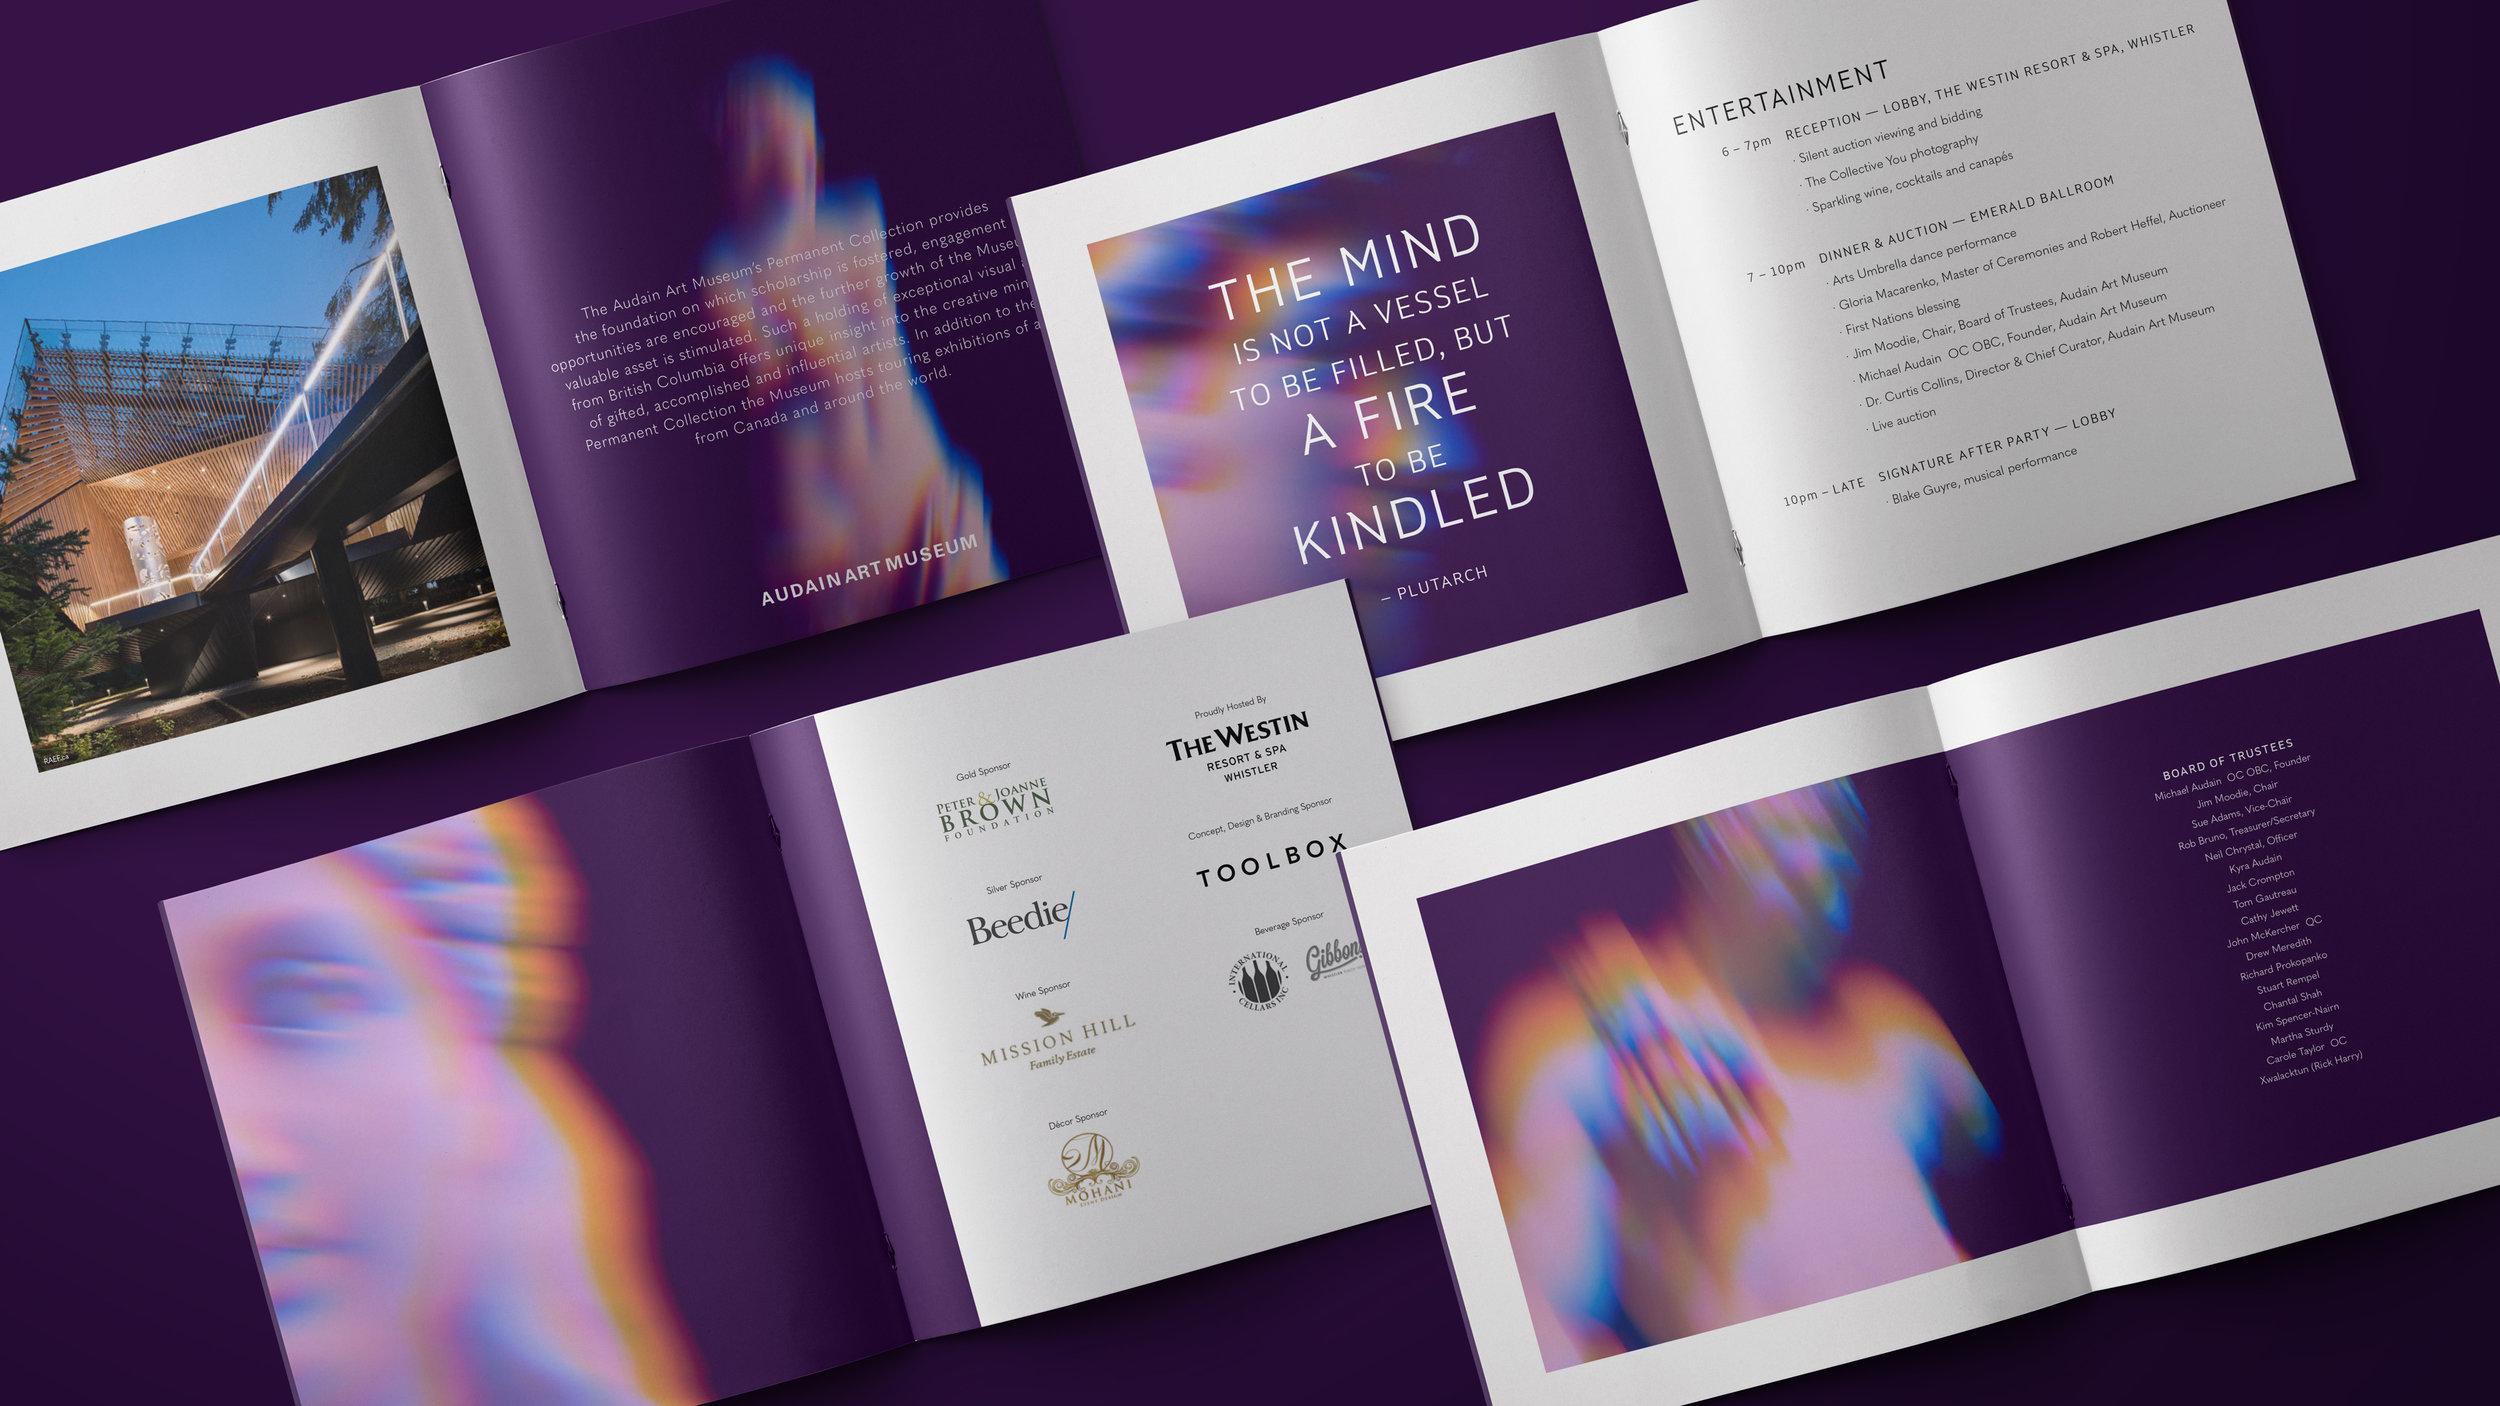 Markus-Wreland-Illuminate-Gala-2019-04.jpg